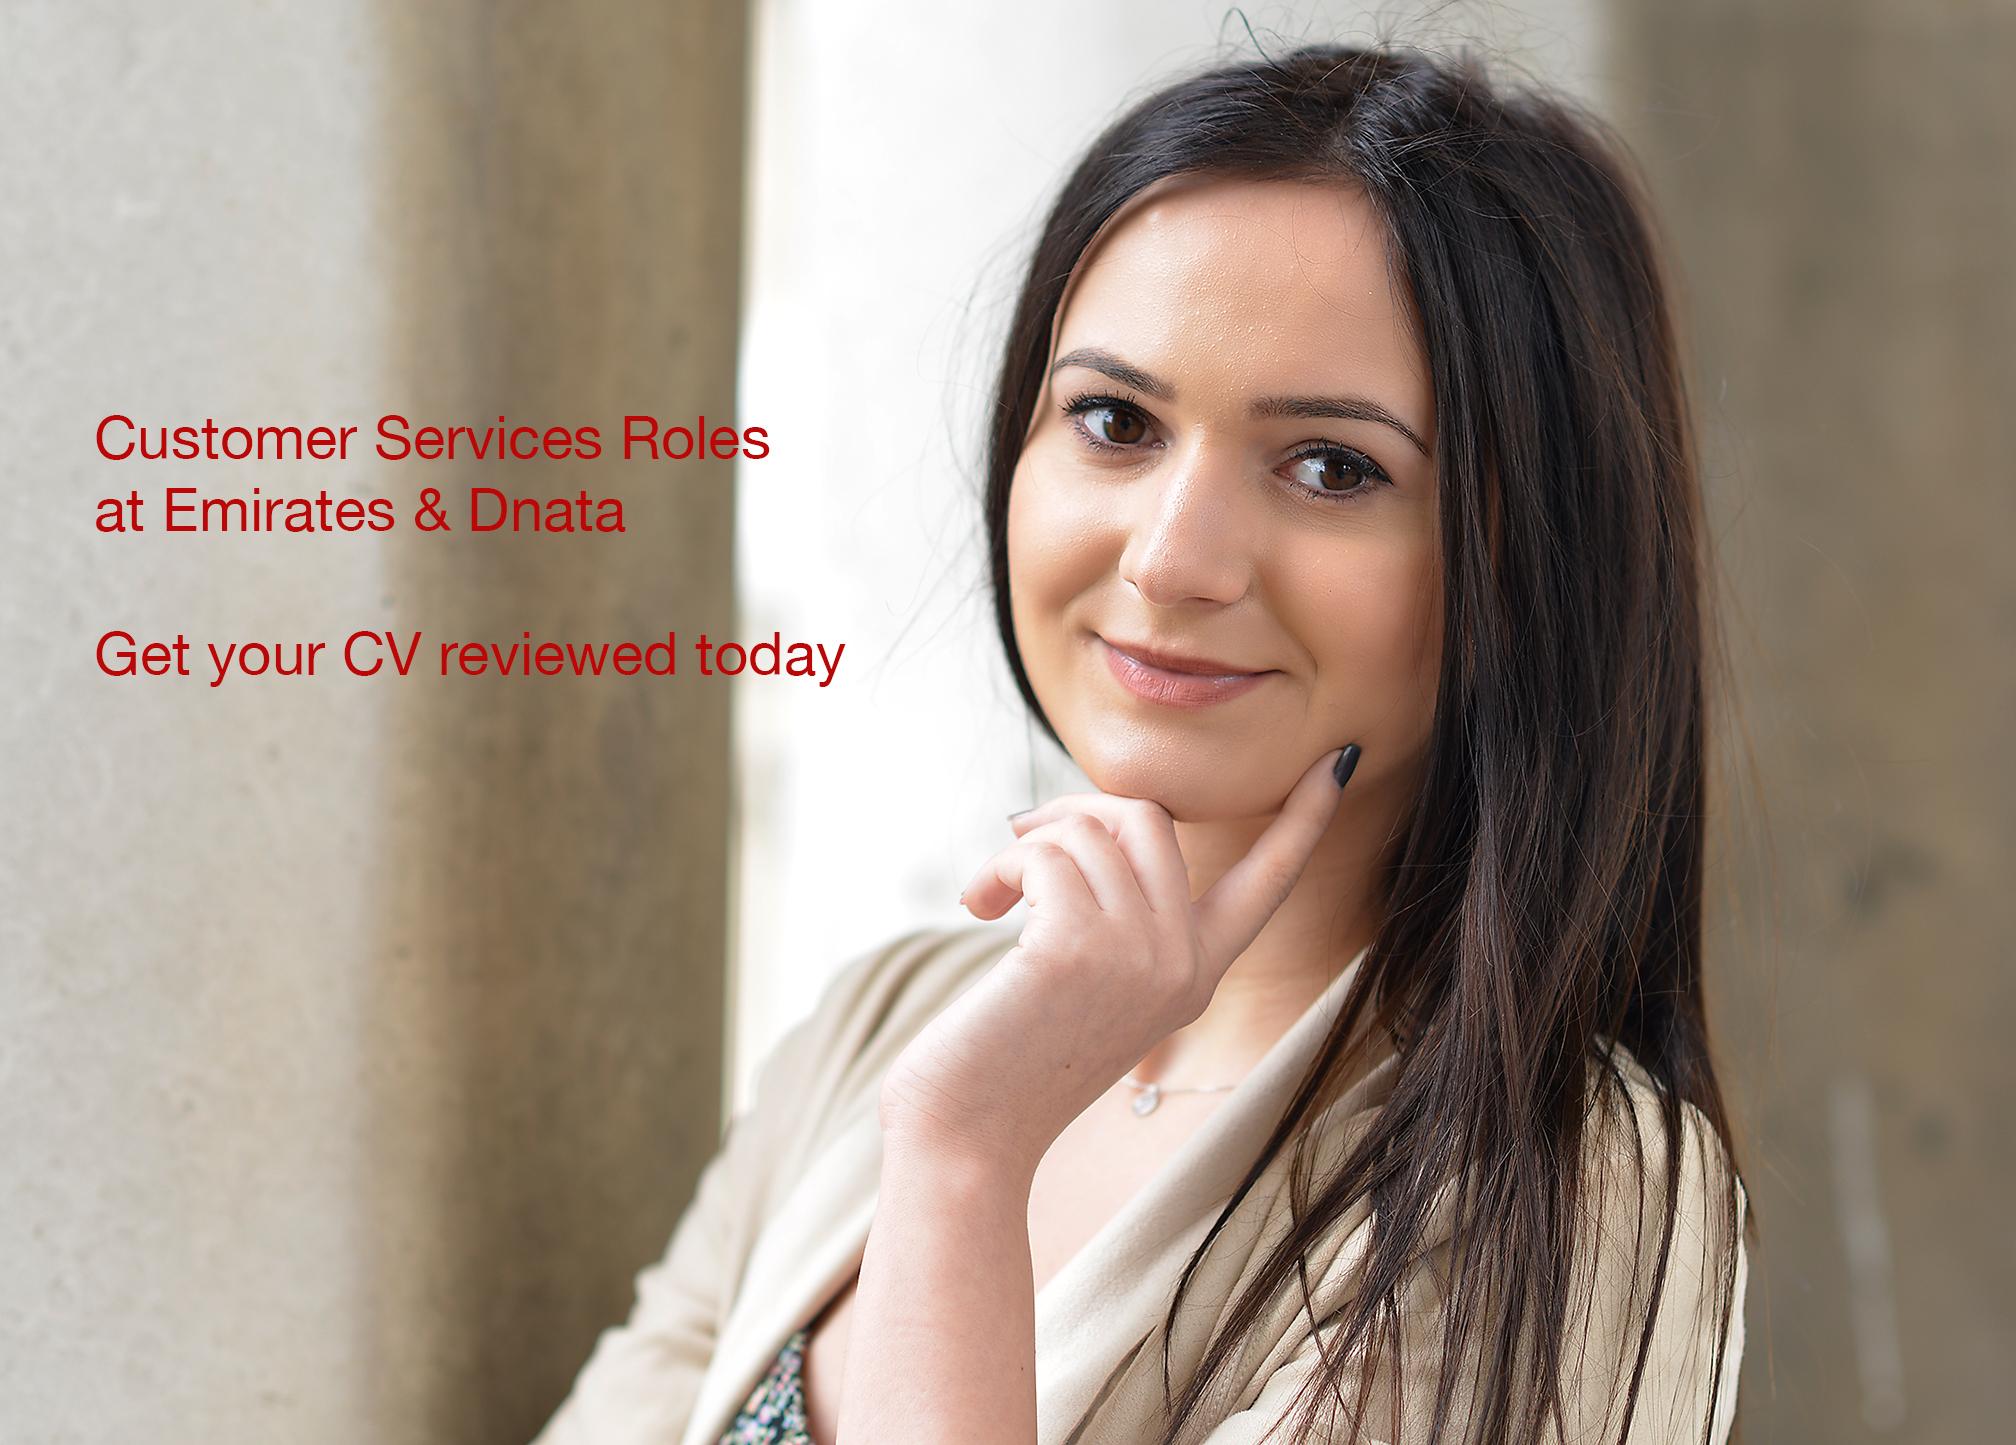 emirates-customer-services-dnata.jpg